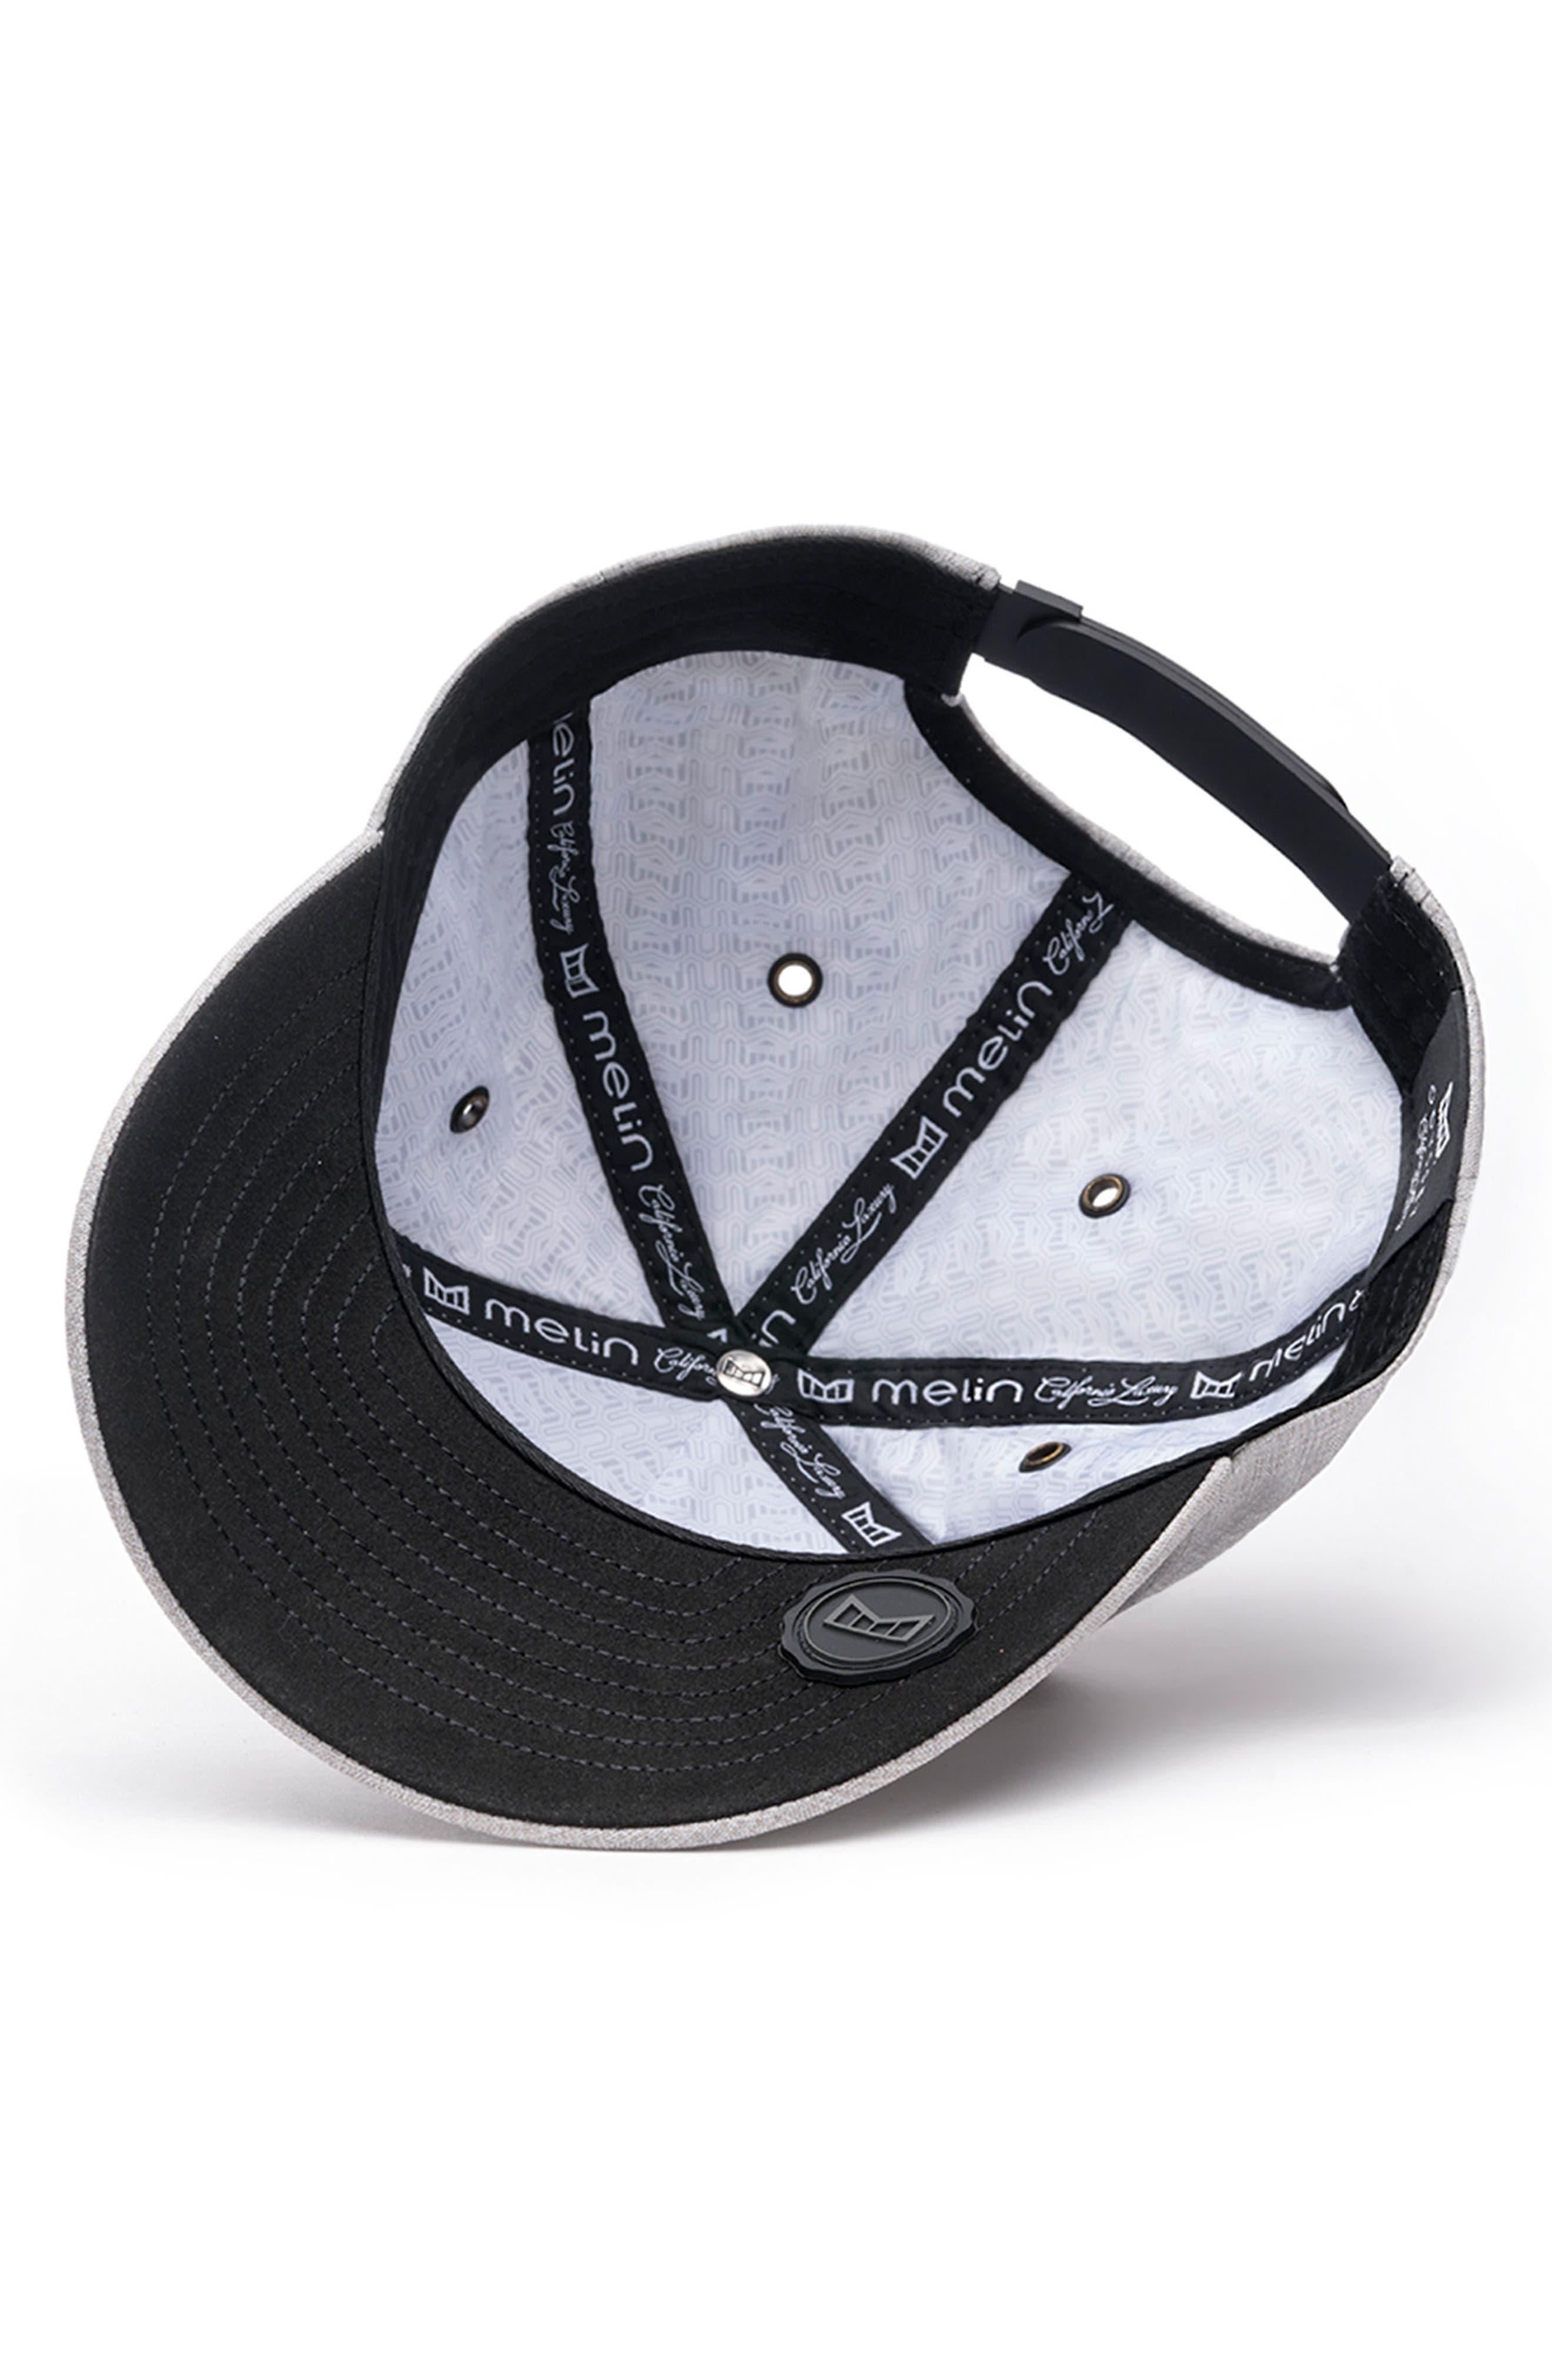 quality design 5a44c 31583 switzerland melin odyssey baseball cap nordstrom c75b9 80faf